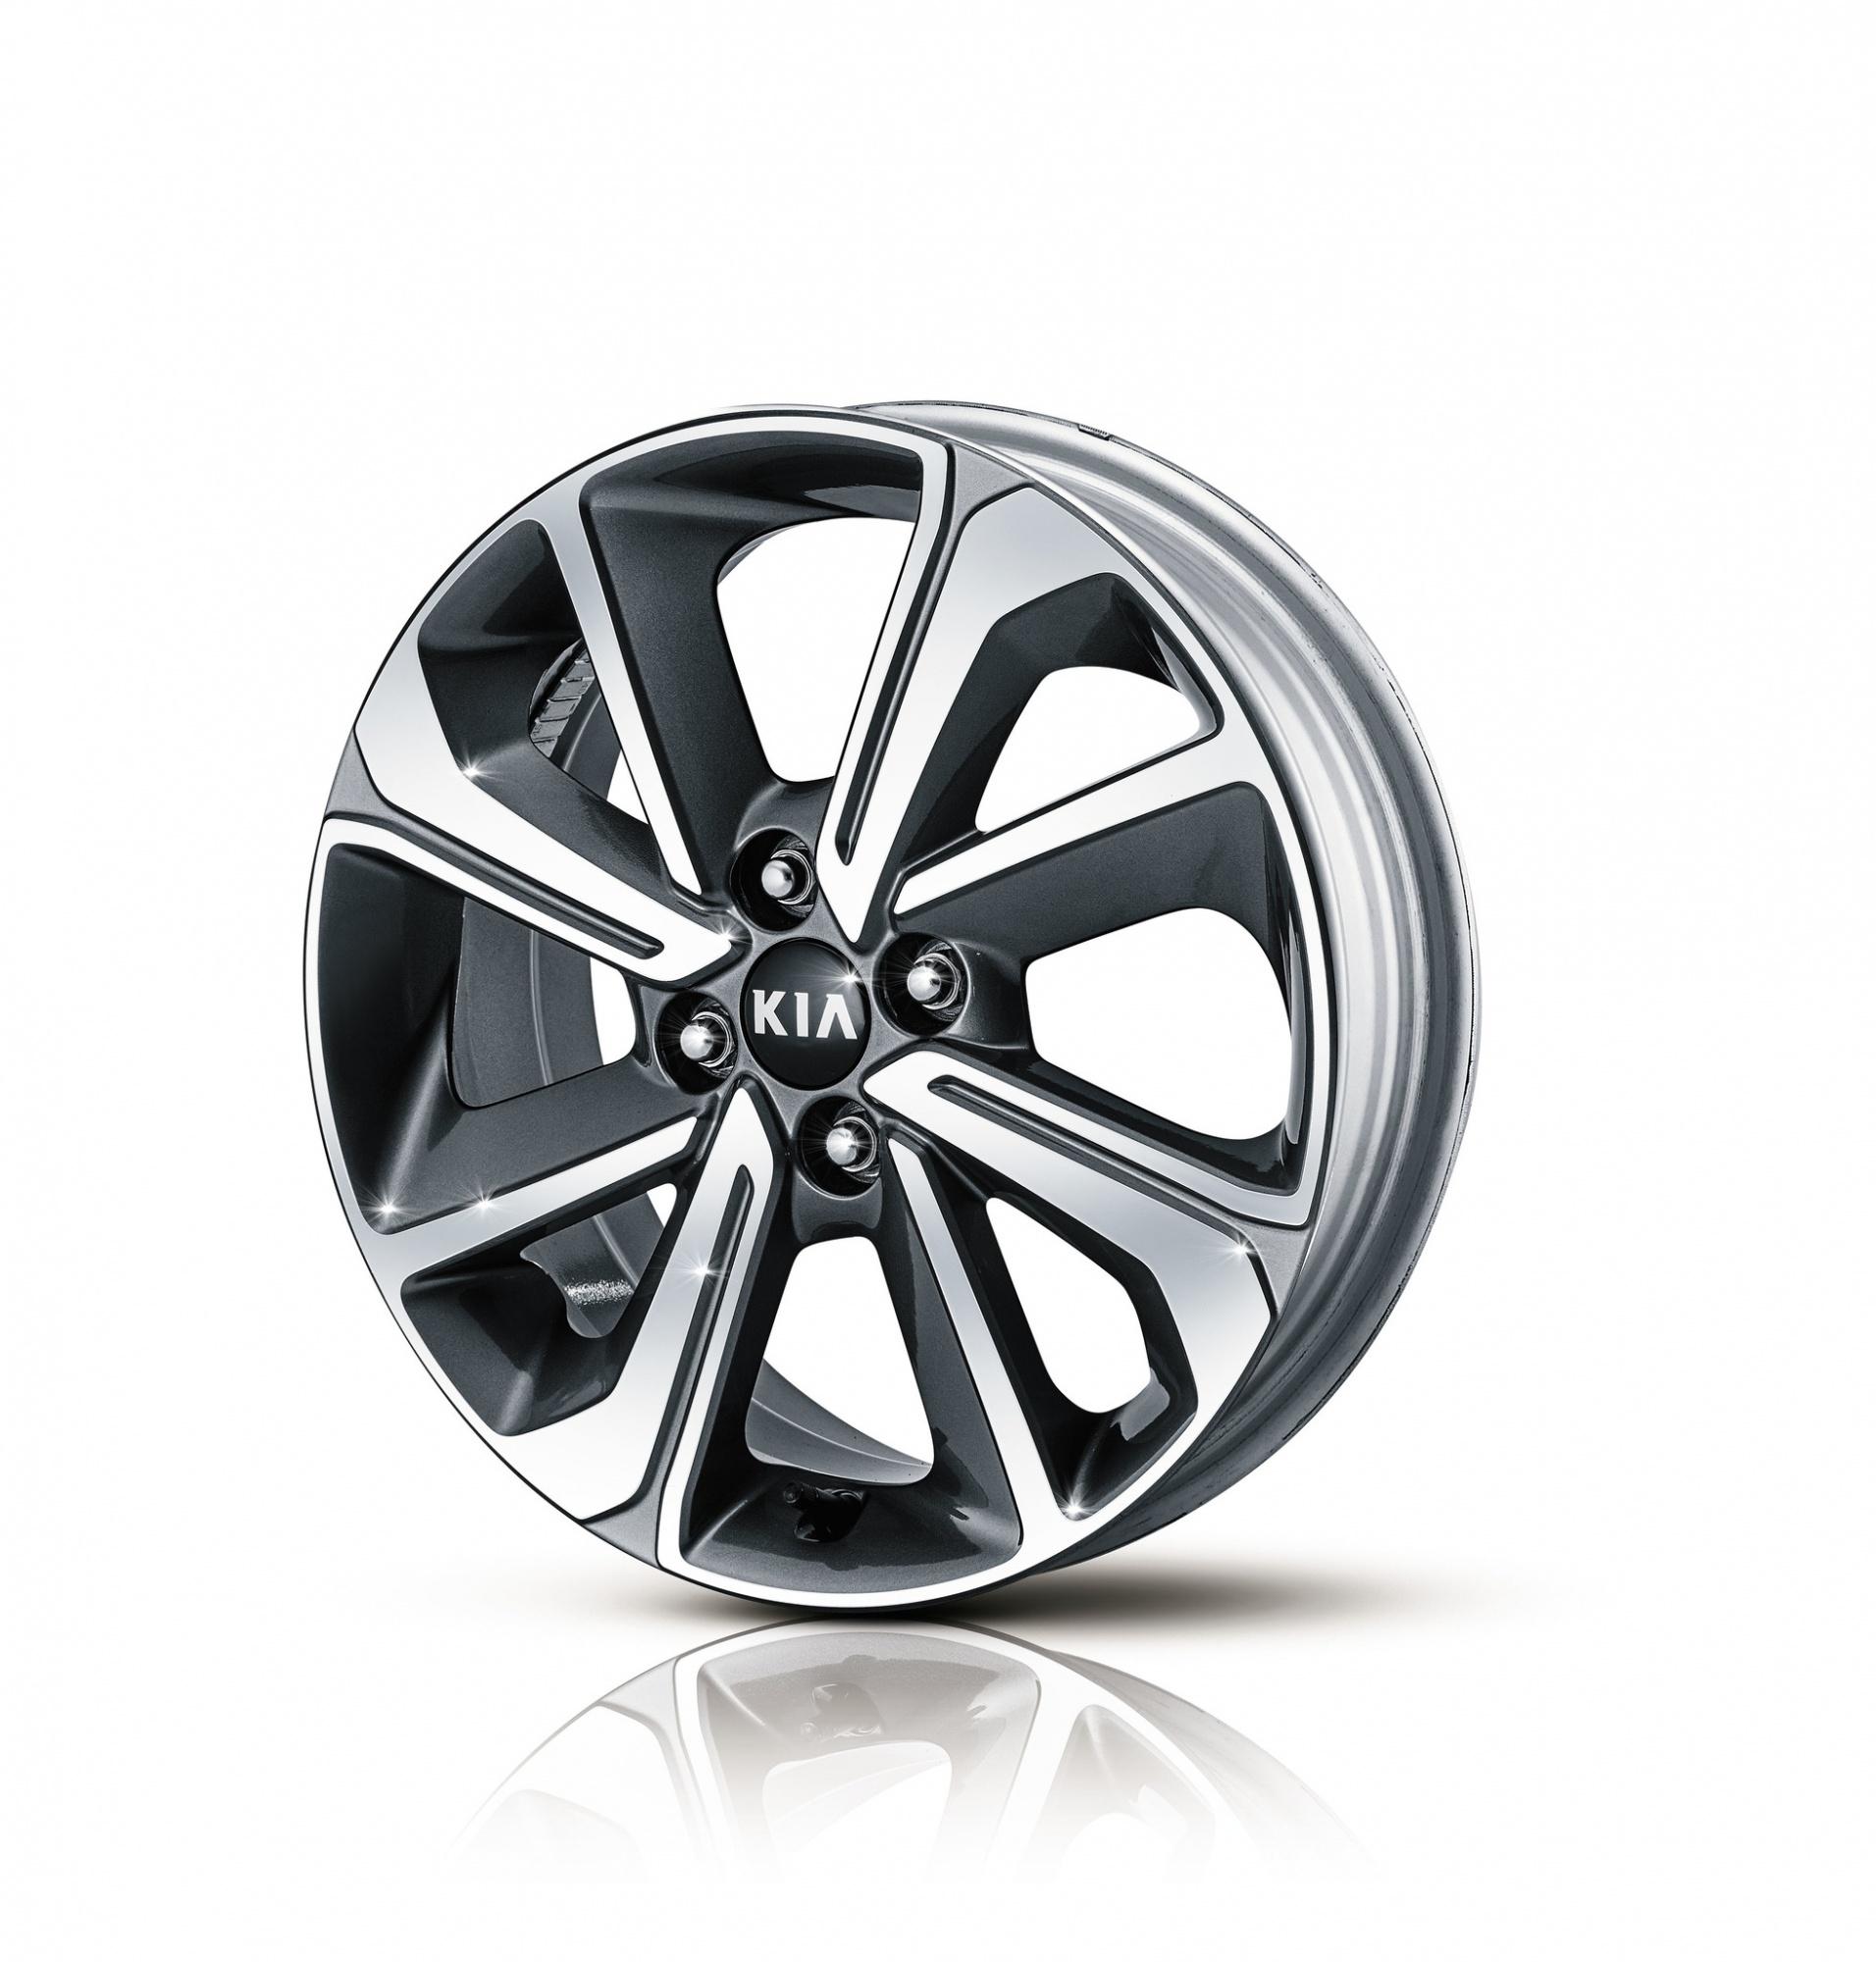 Колесный диск легкосплавный R16 Hyundai Kia 52910H0200 для Kia Rio 2017- штатный колесный диск 19 дюймов mobis 52910d4710 для kia optima 2018